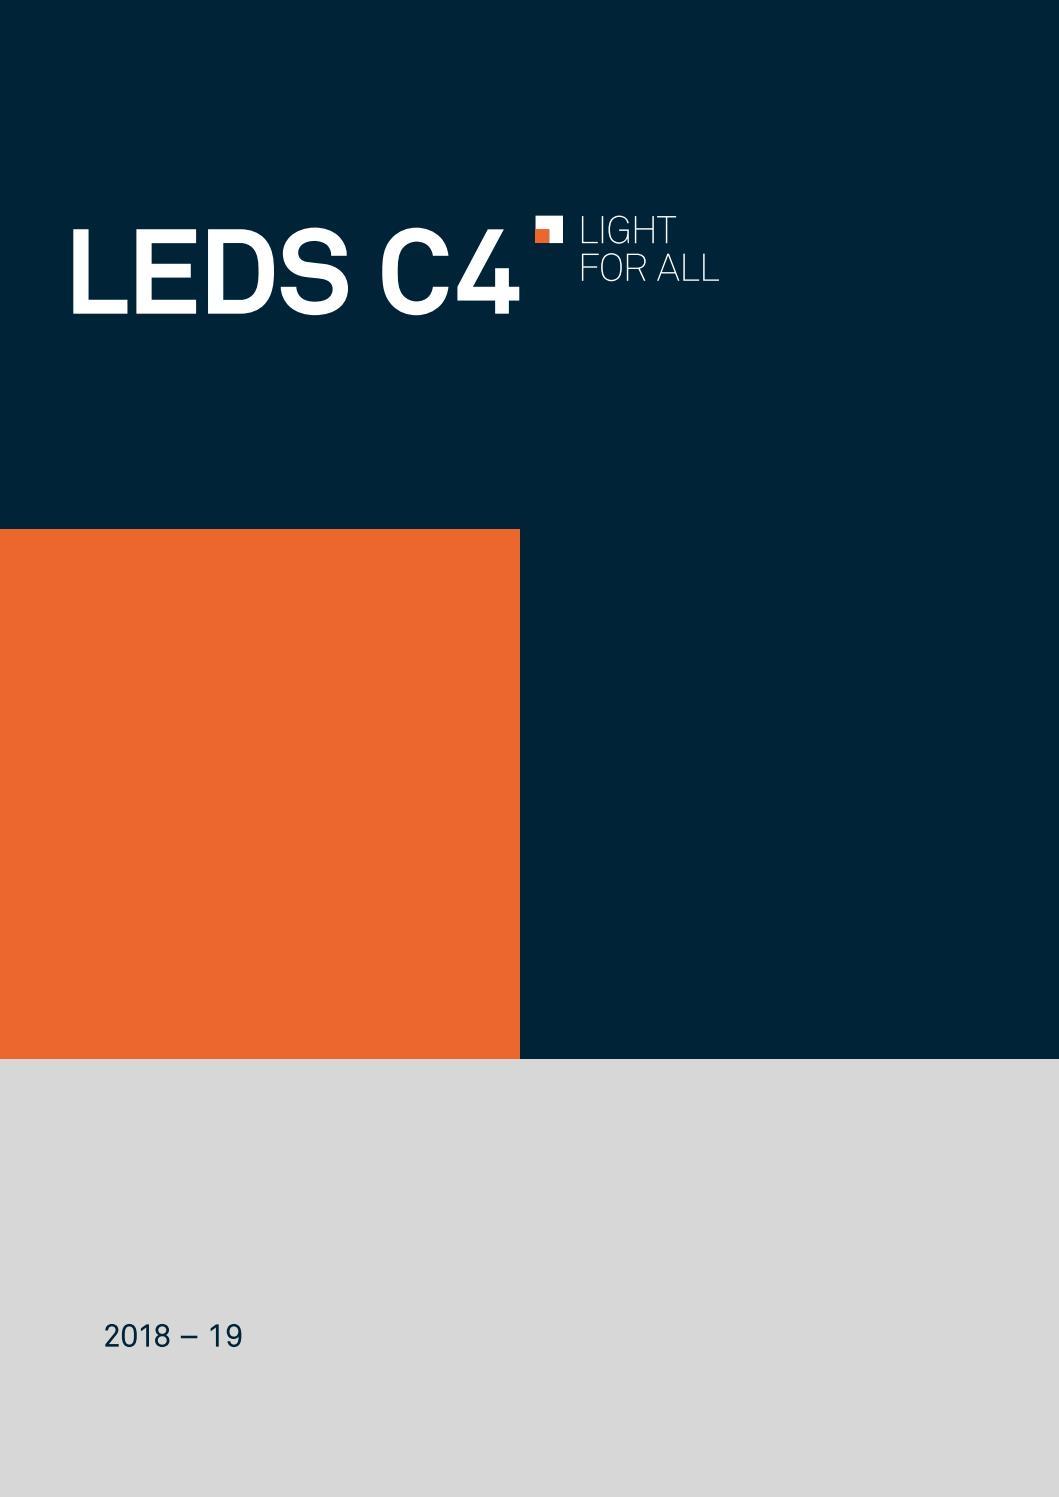 Característica para LED 60 Moderno/Contemporáneo Lámpara de Mesa con Otro Utilizar Interruptor On/Off Cambiar 220-240v